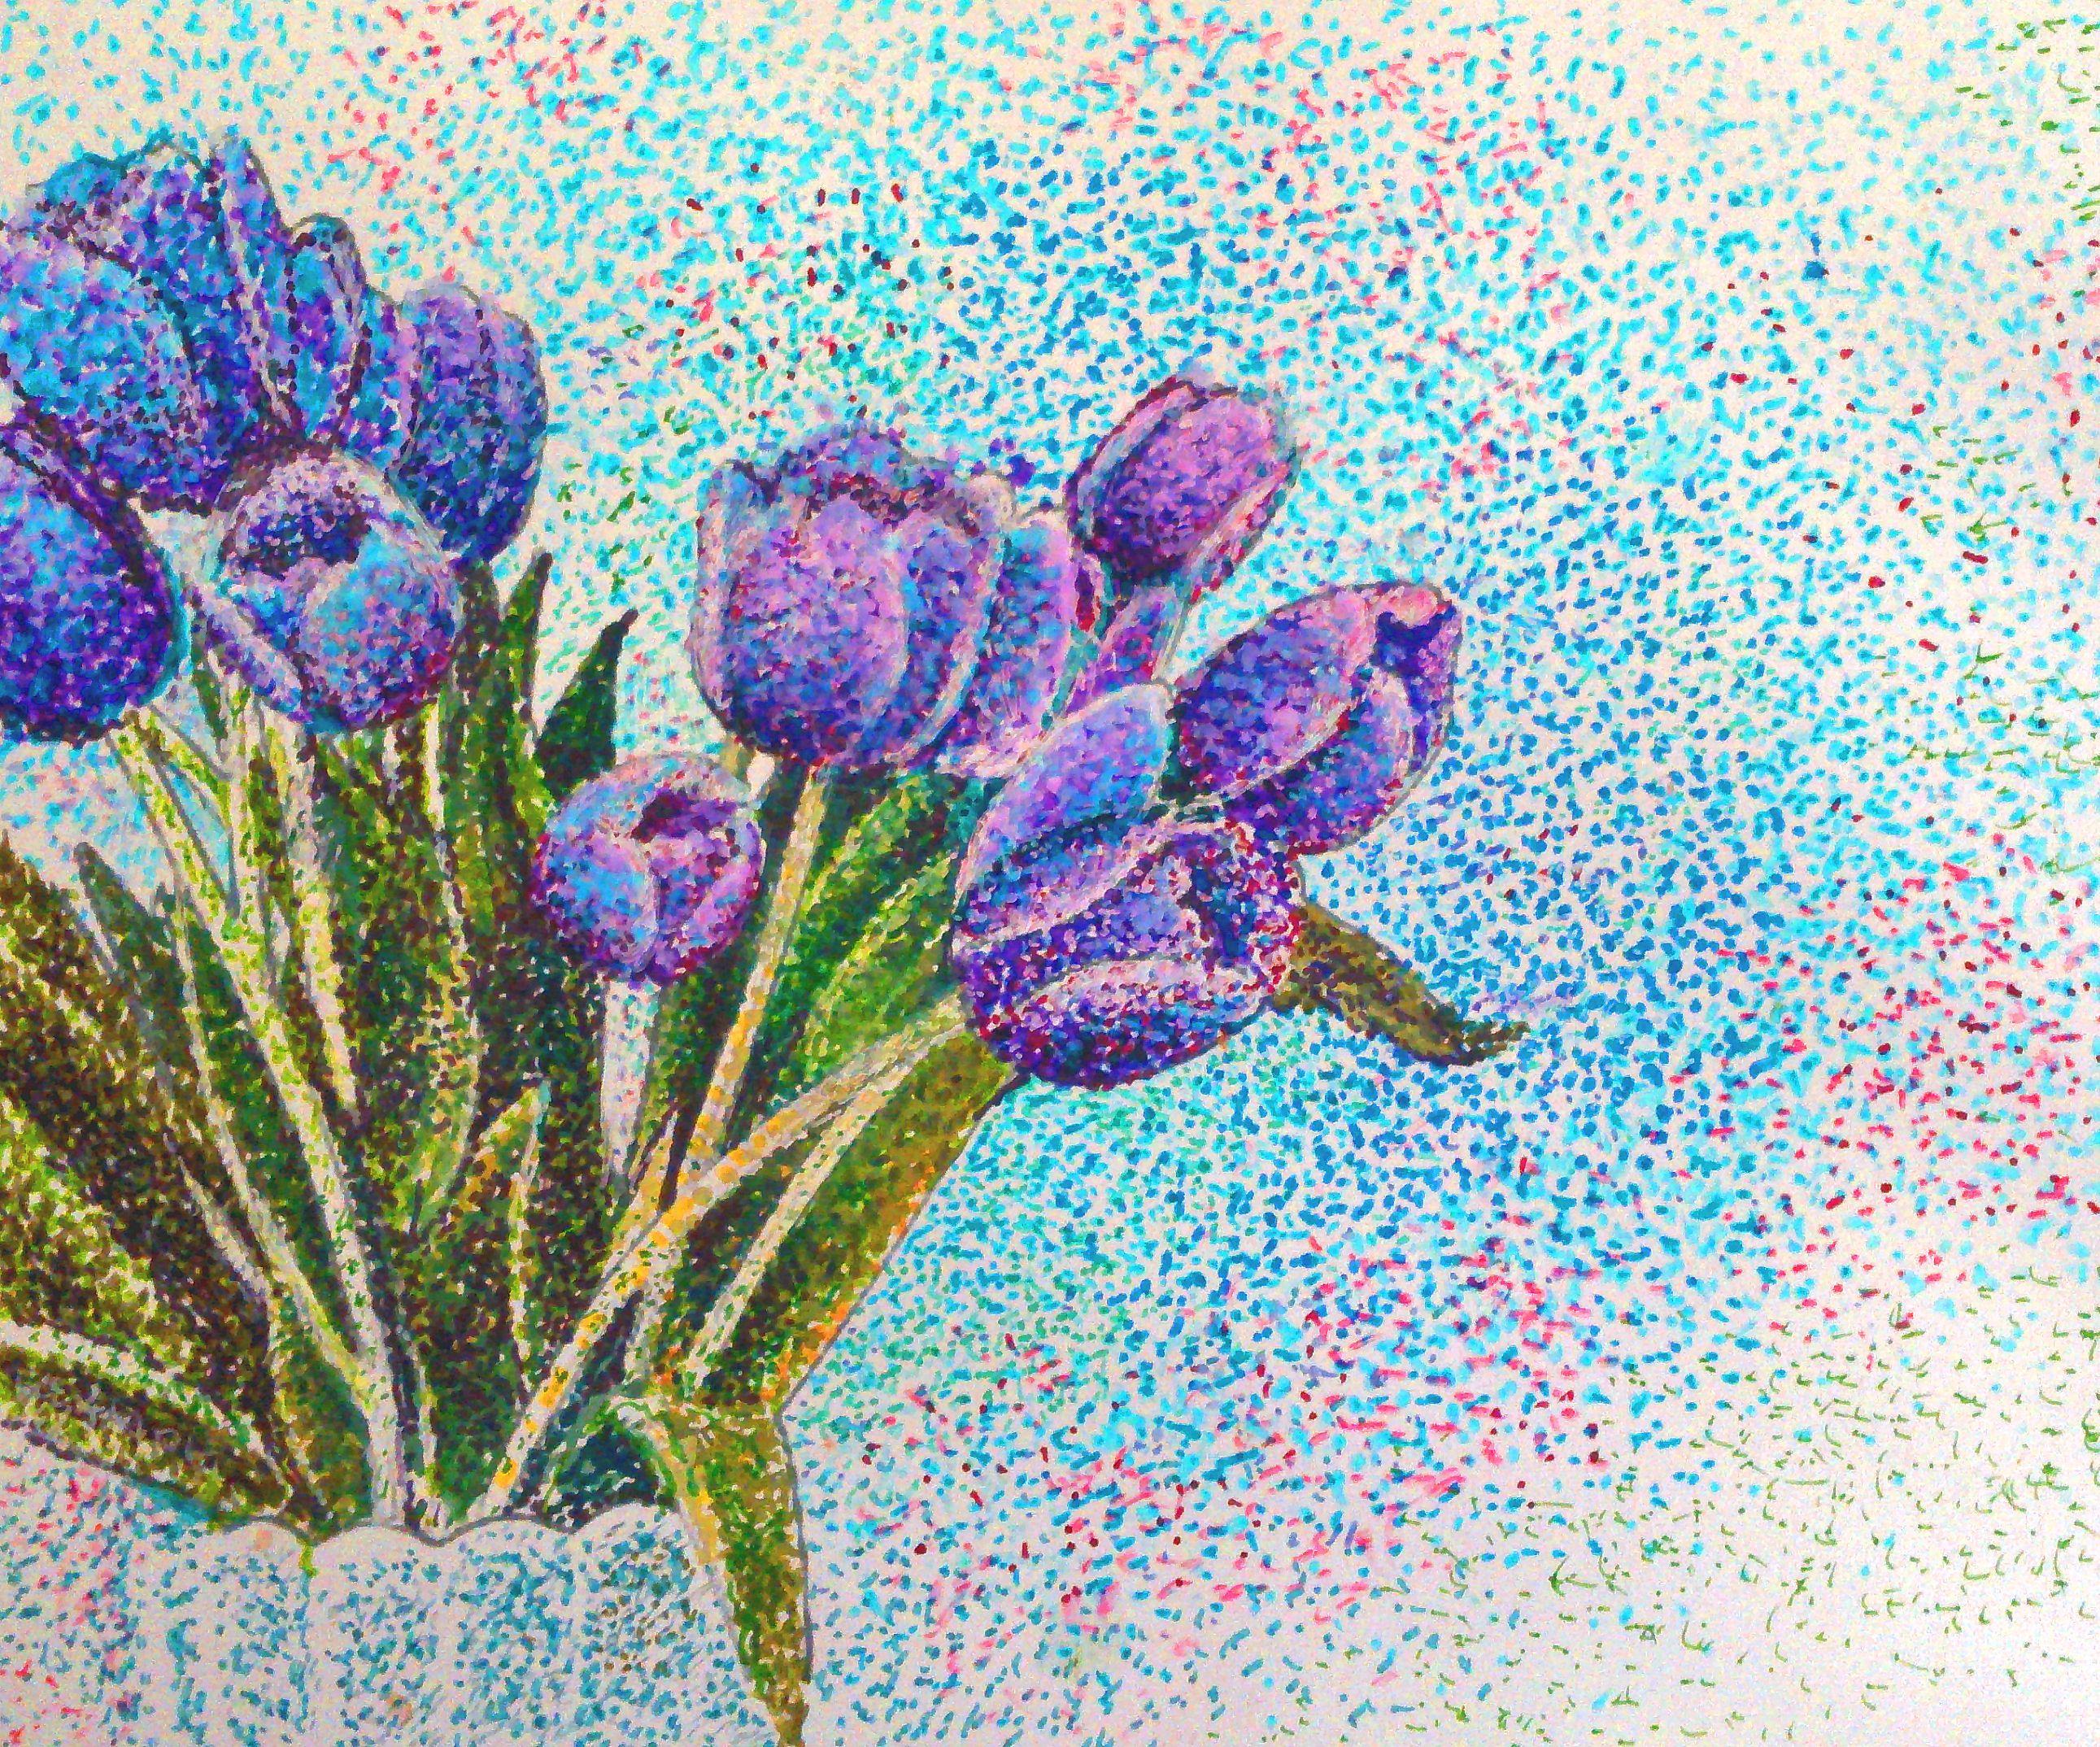 more pointillism!   Dessins en pointillés, Art moderne, Pointillisme